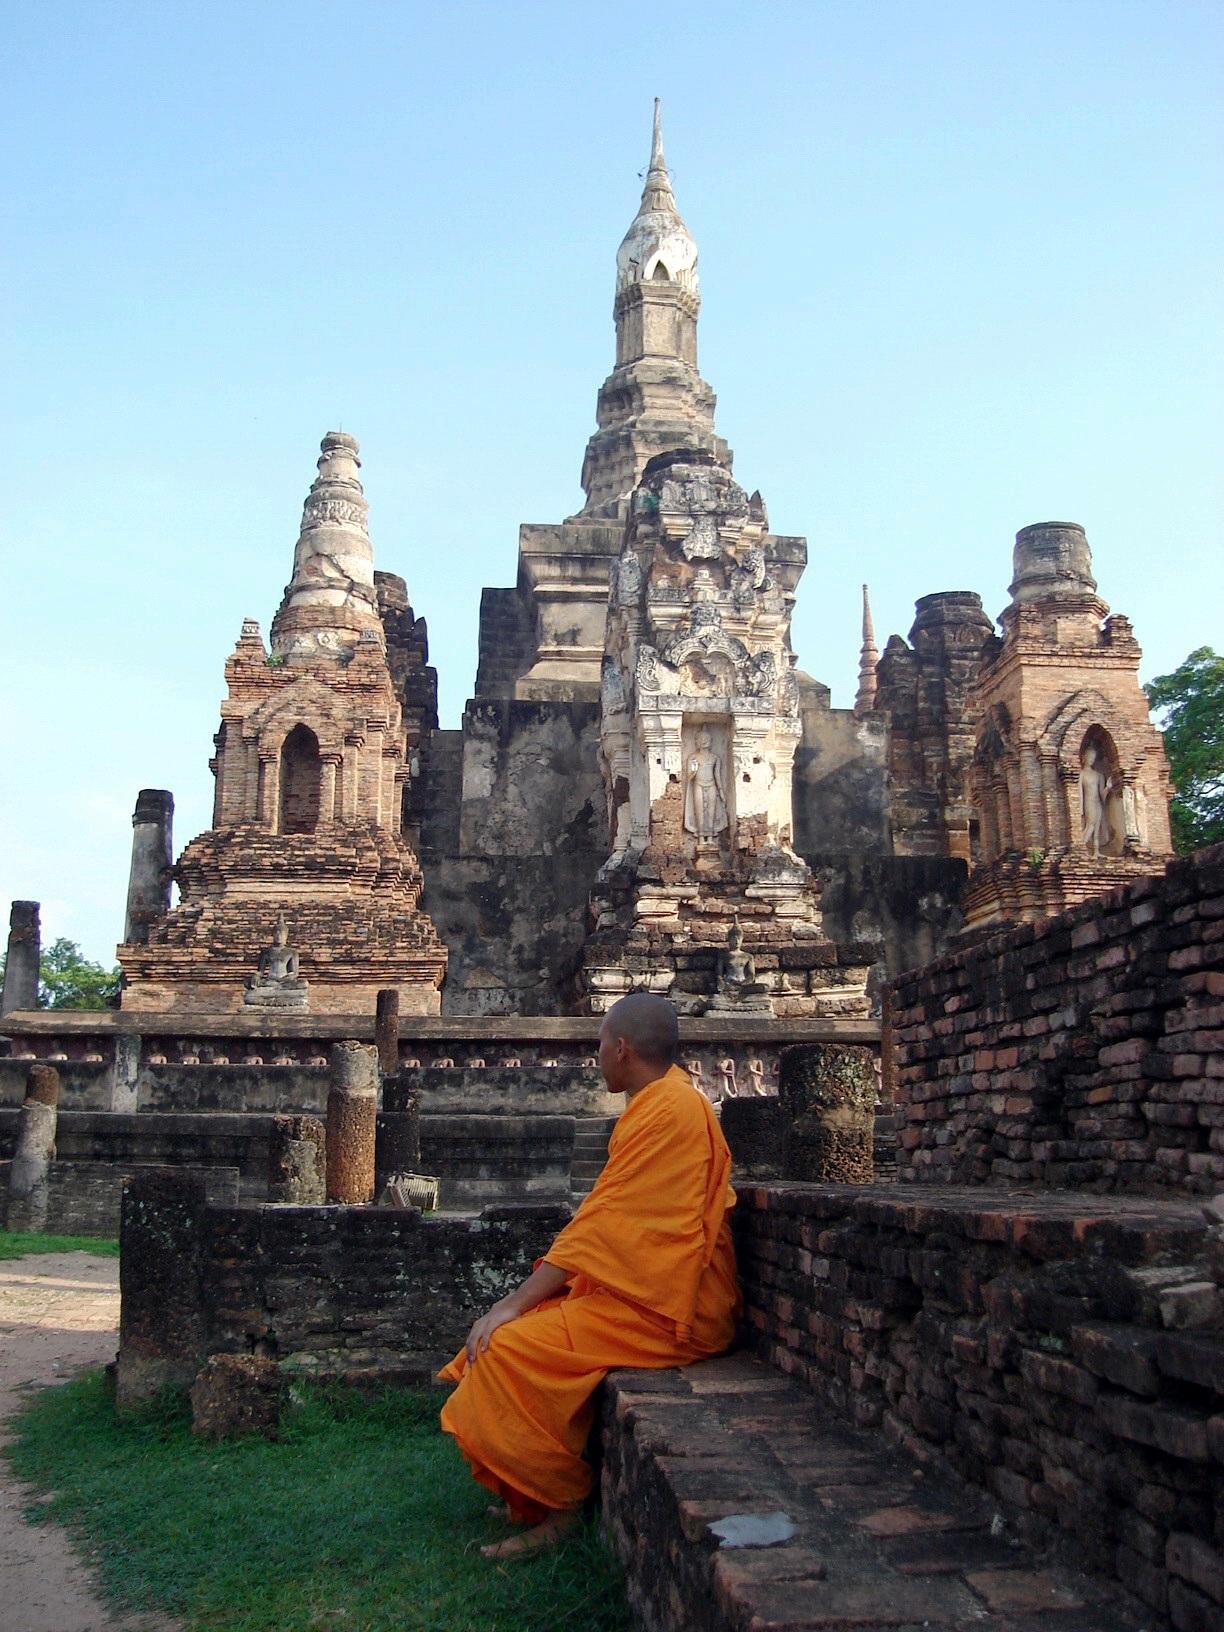 File:Wat Mahathat Sukhothai 03.jpg - Wikimedia Commons